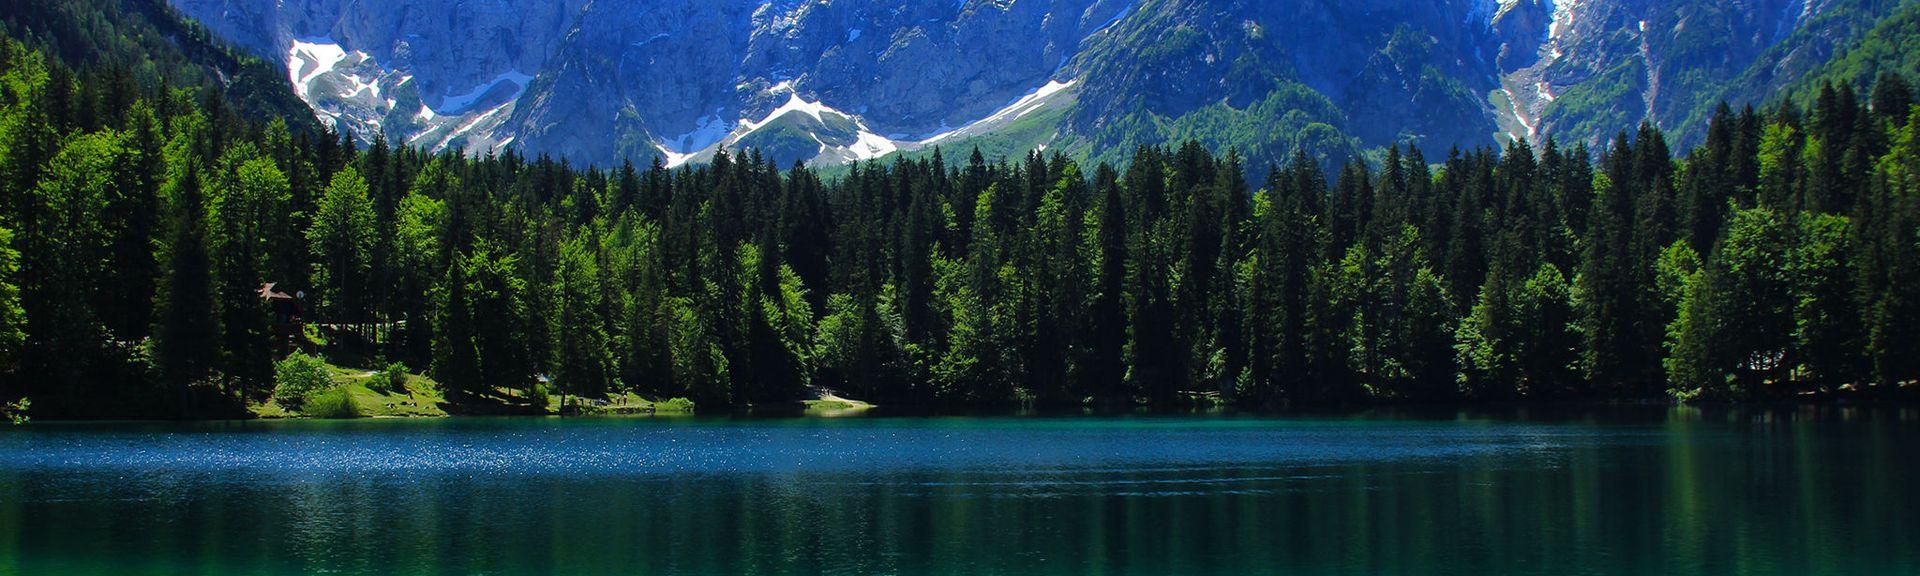 Kranjska Gora, Kranjska Gora, Slovenia